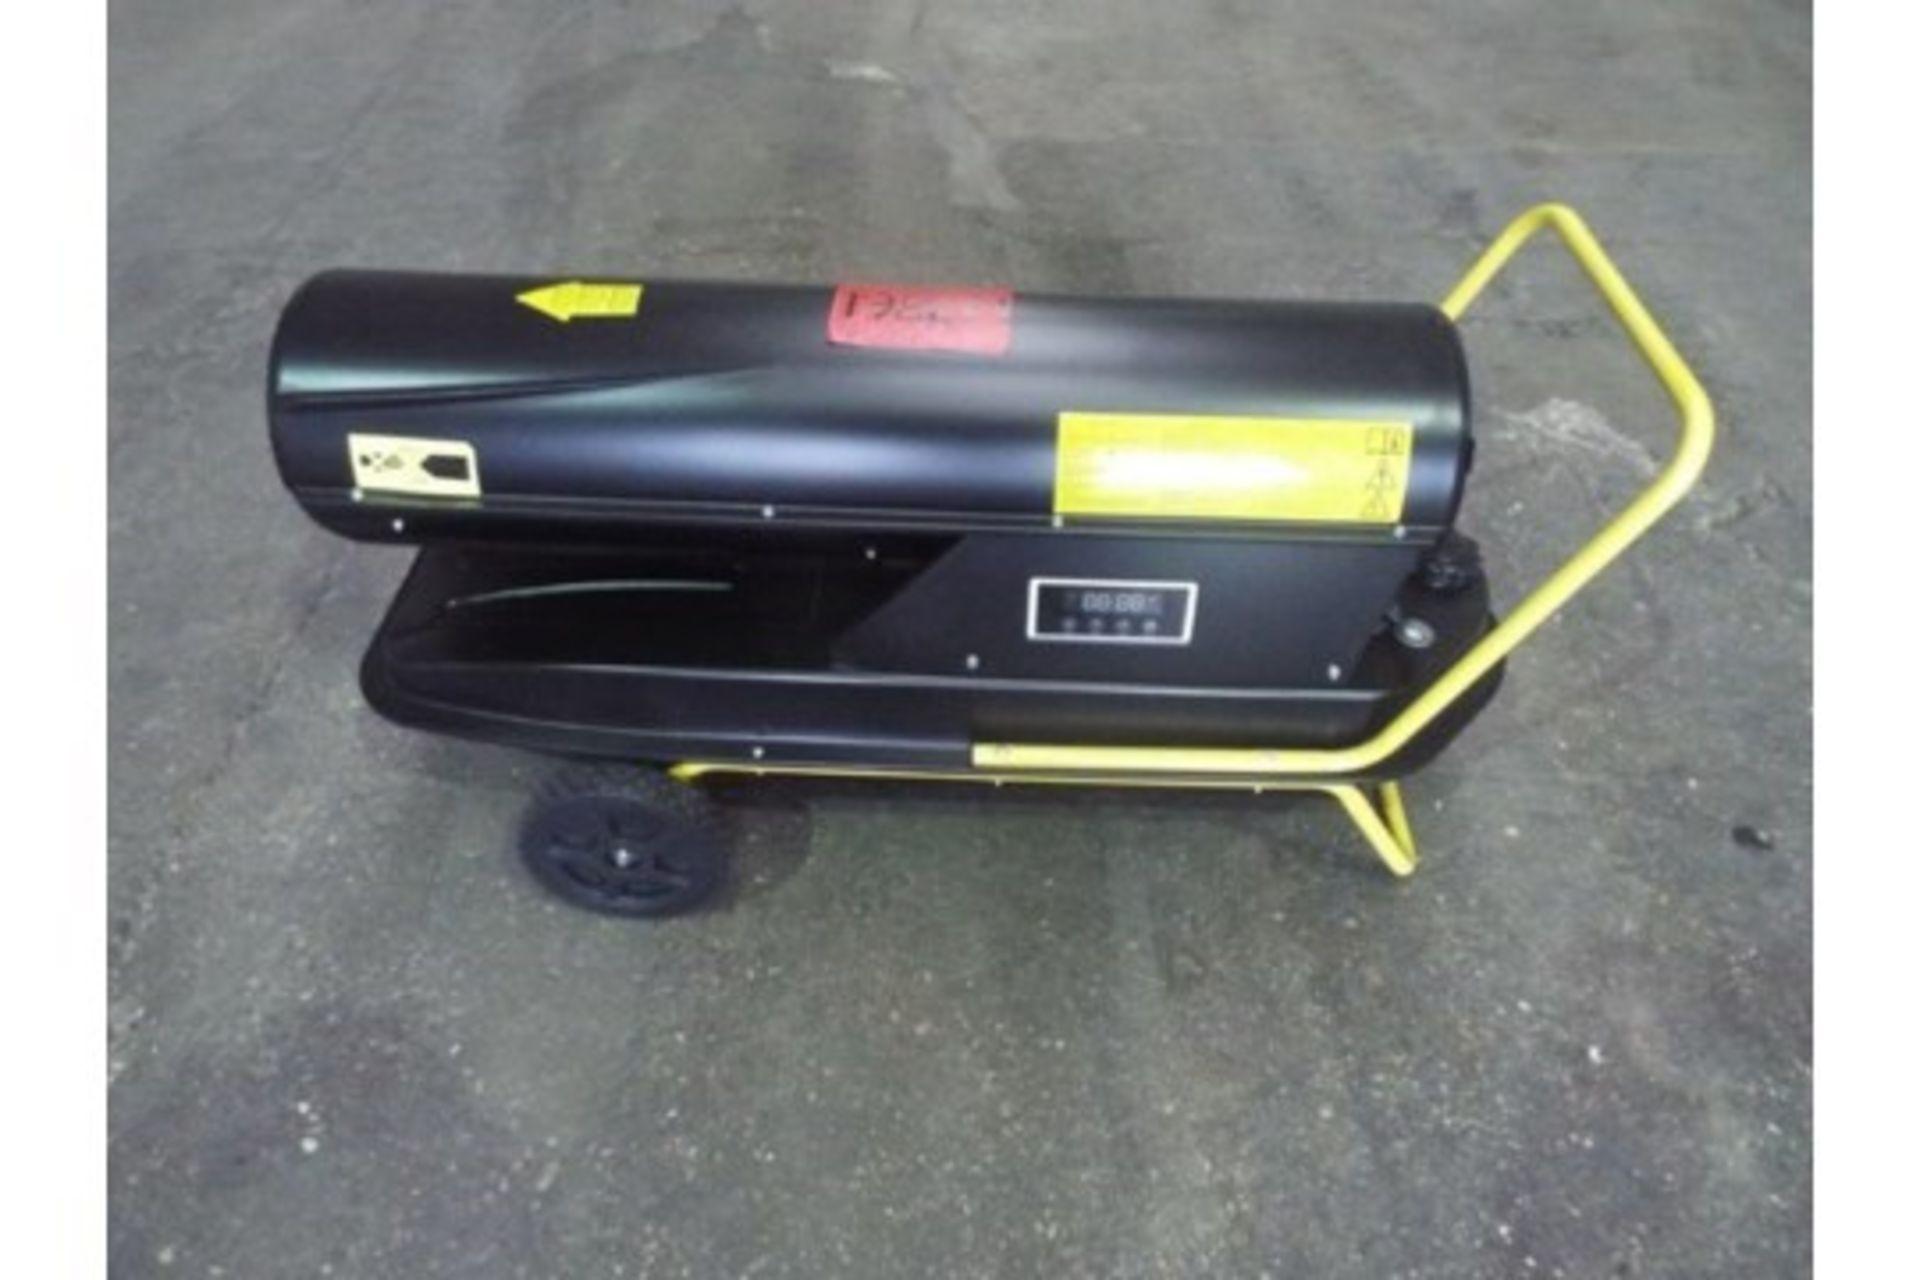 Lot 25864 - ** BRAND NEW ** XDFT-50 Diesel Space Heater